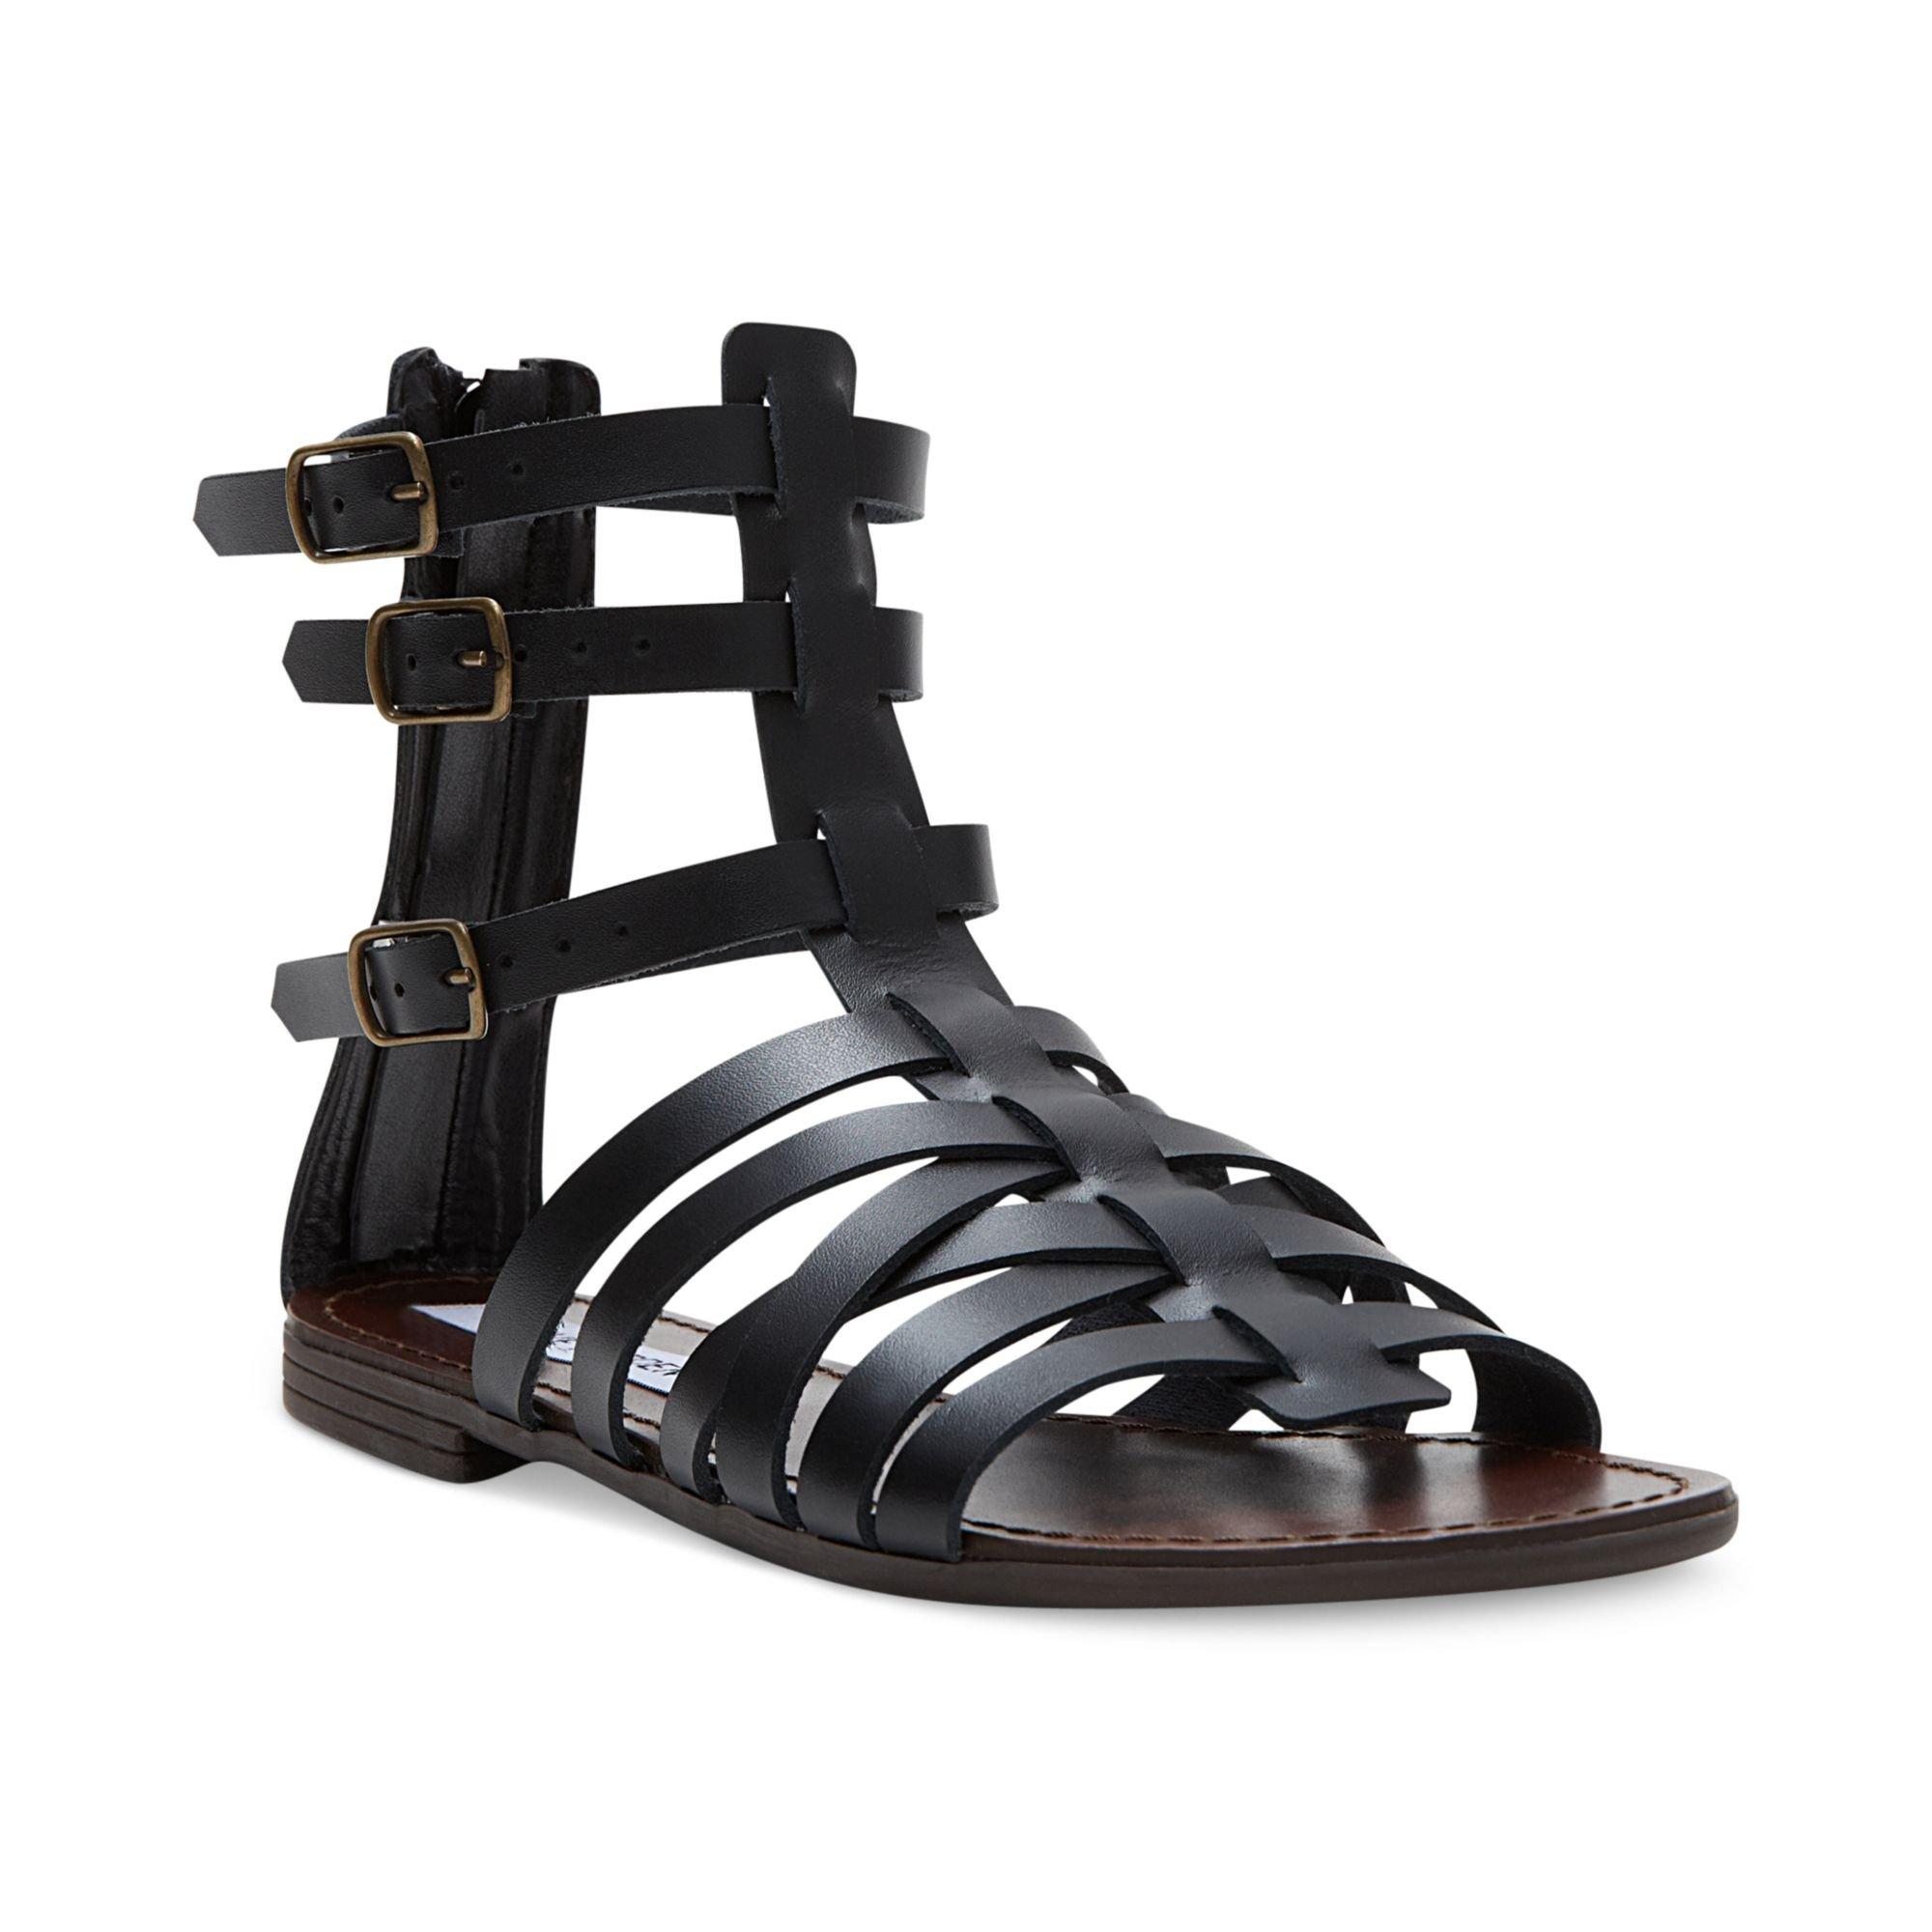 7bf8c3ebf38 Black Strappy Sandals: Steve Madden Gladiator Sandals